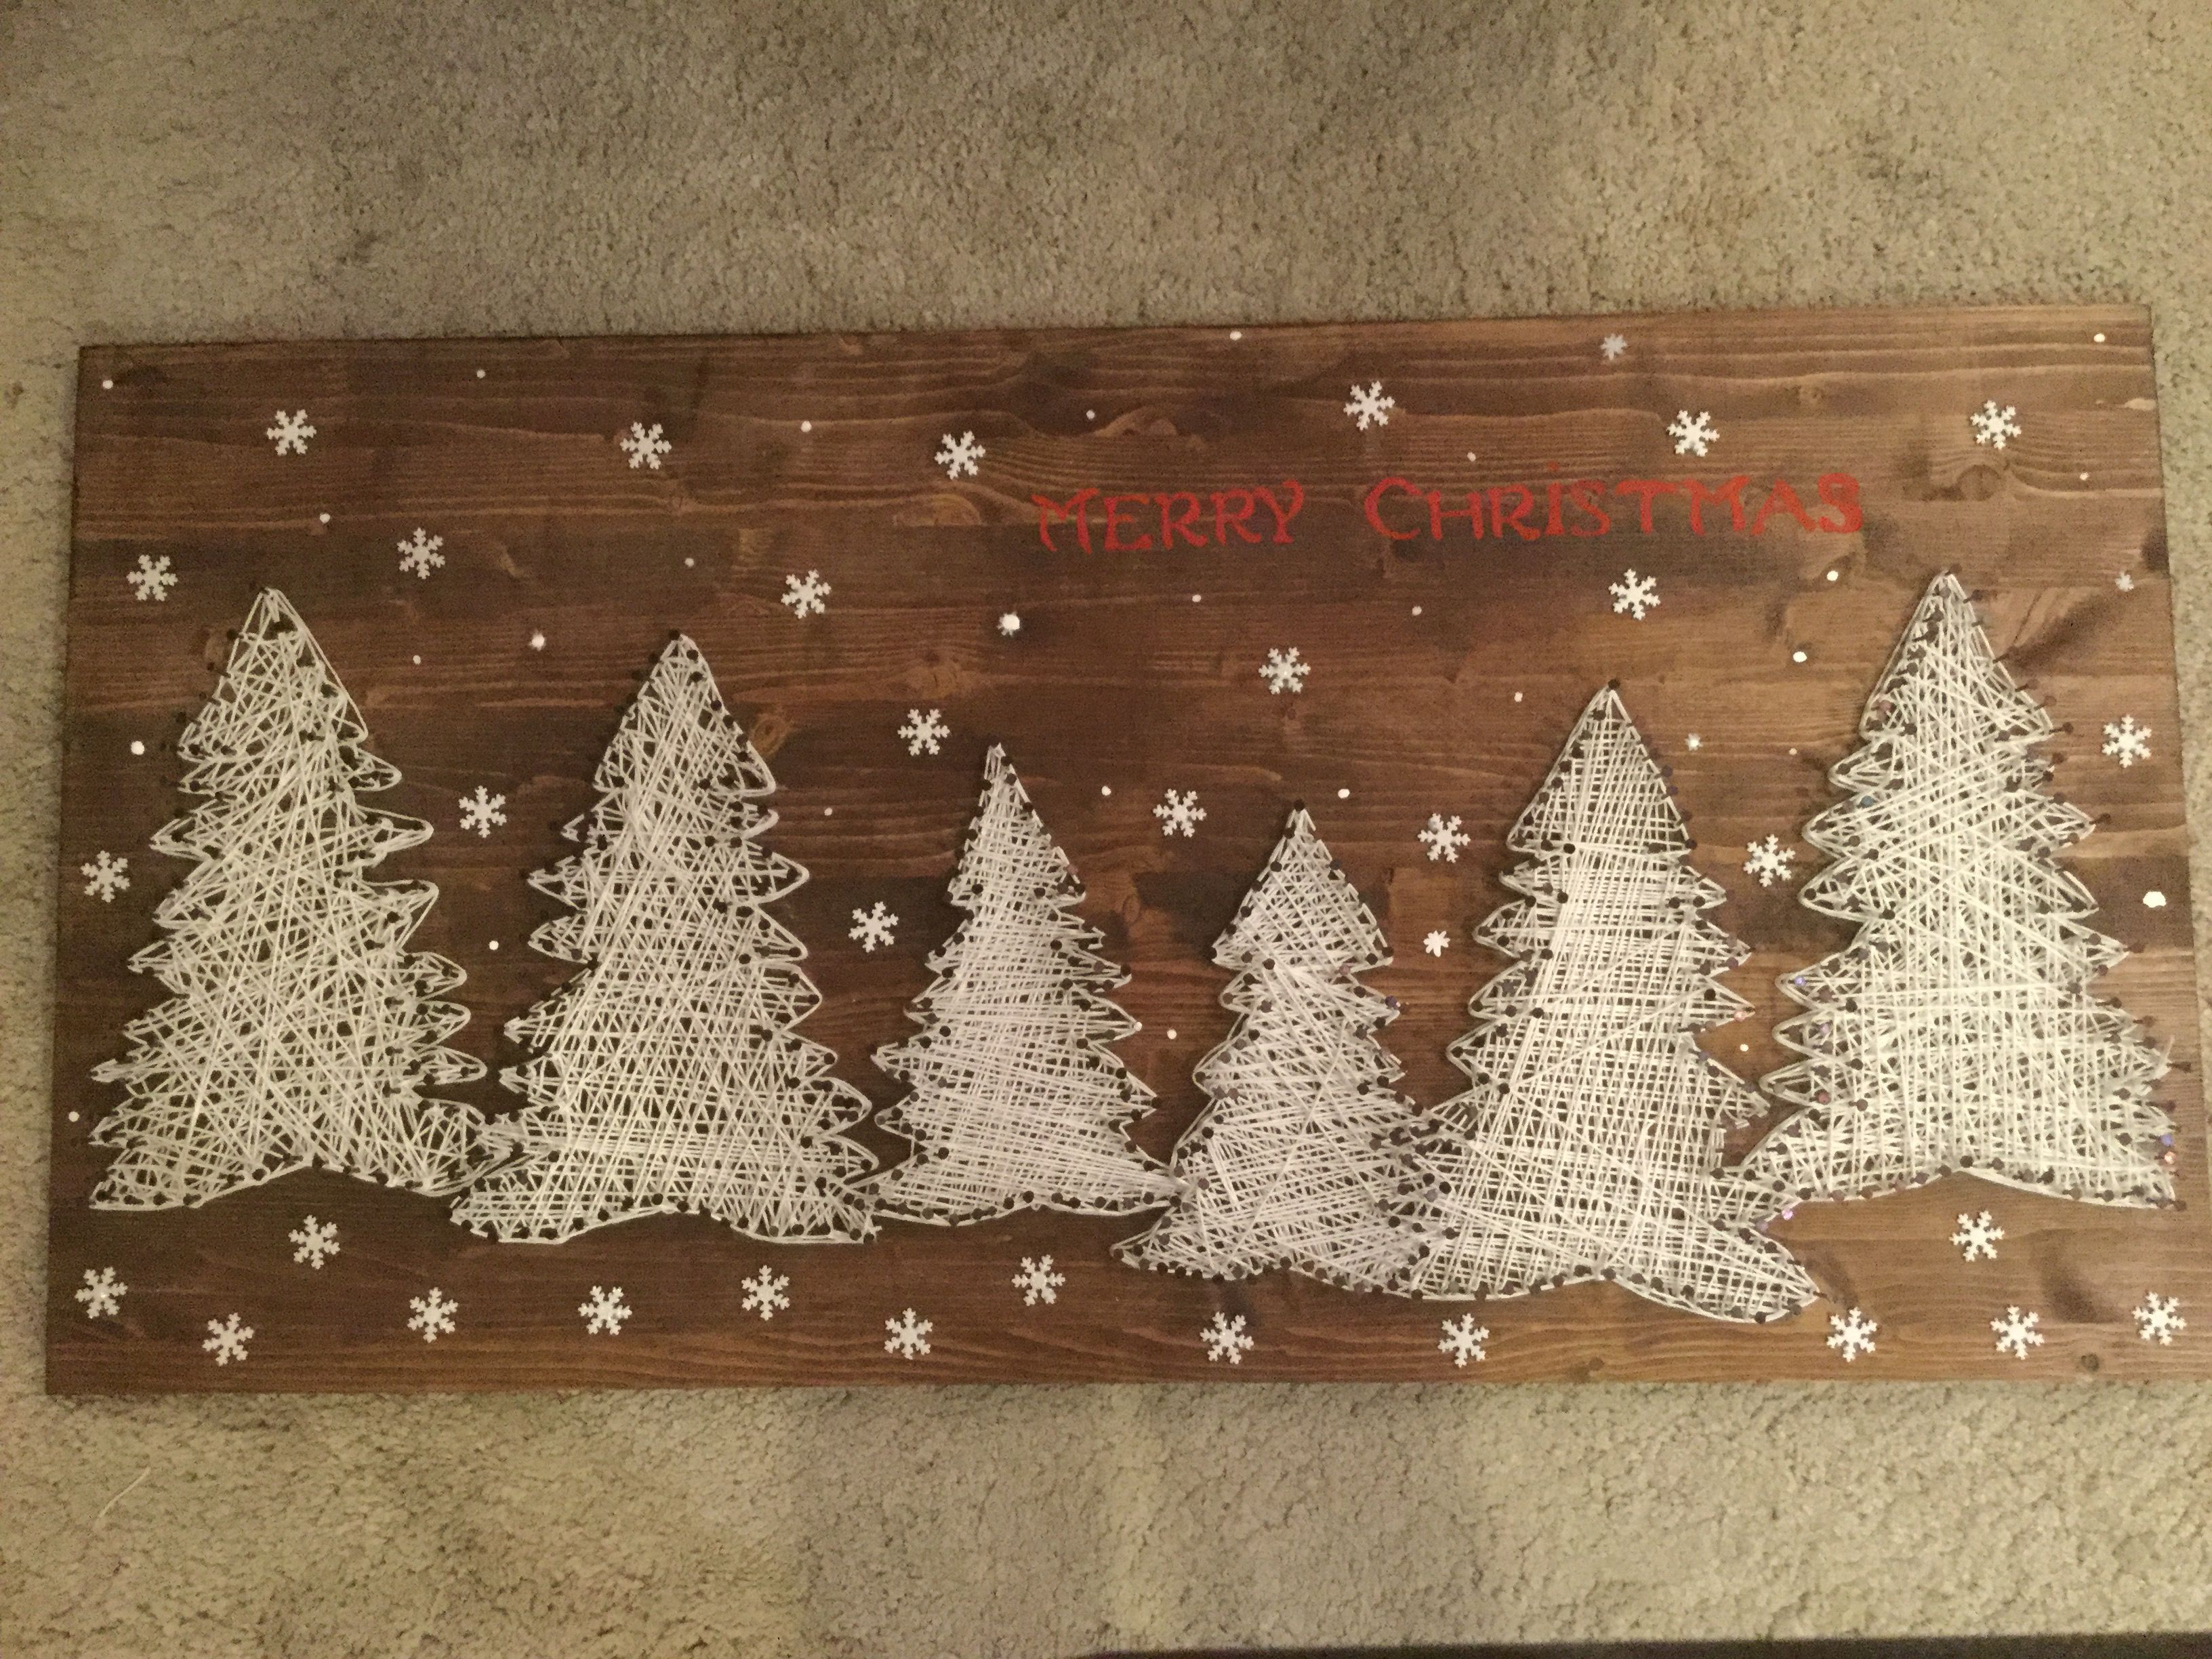 Pine tree string art wood. Alessandra Vinci #stringart